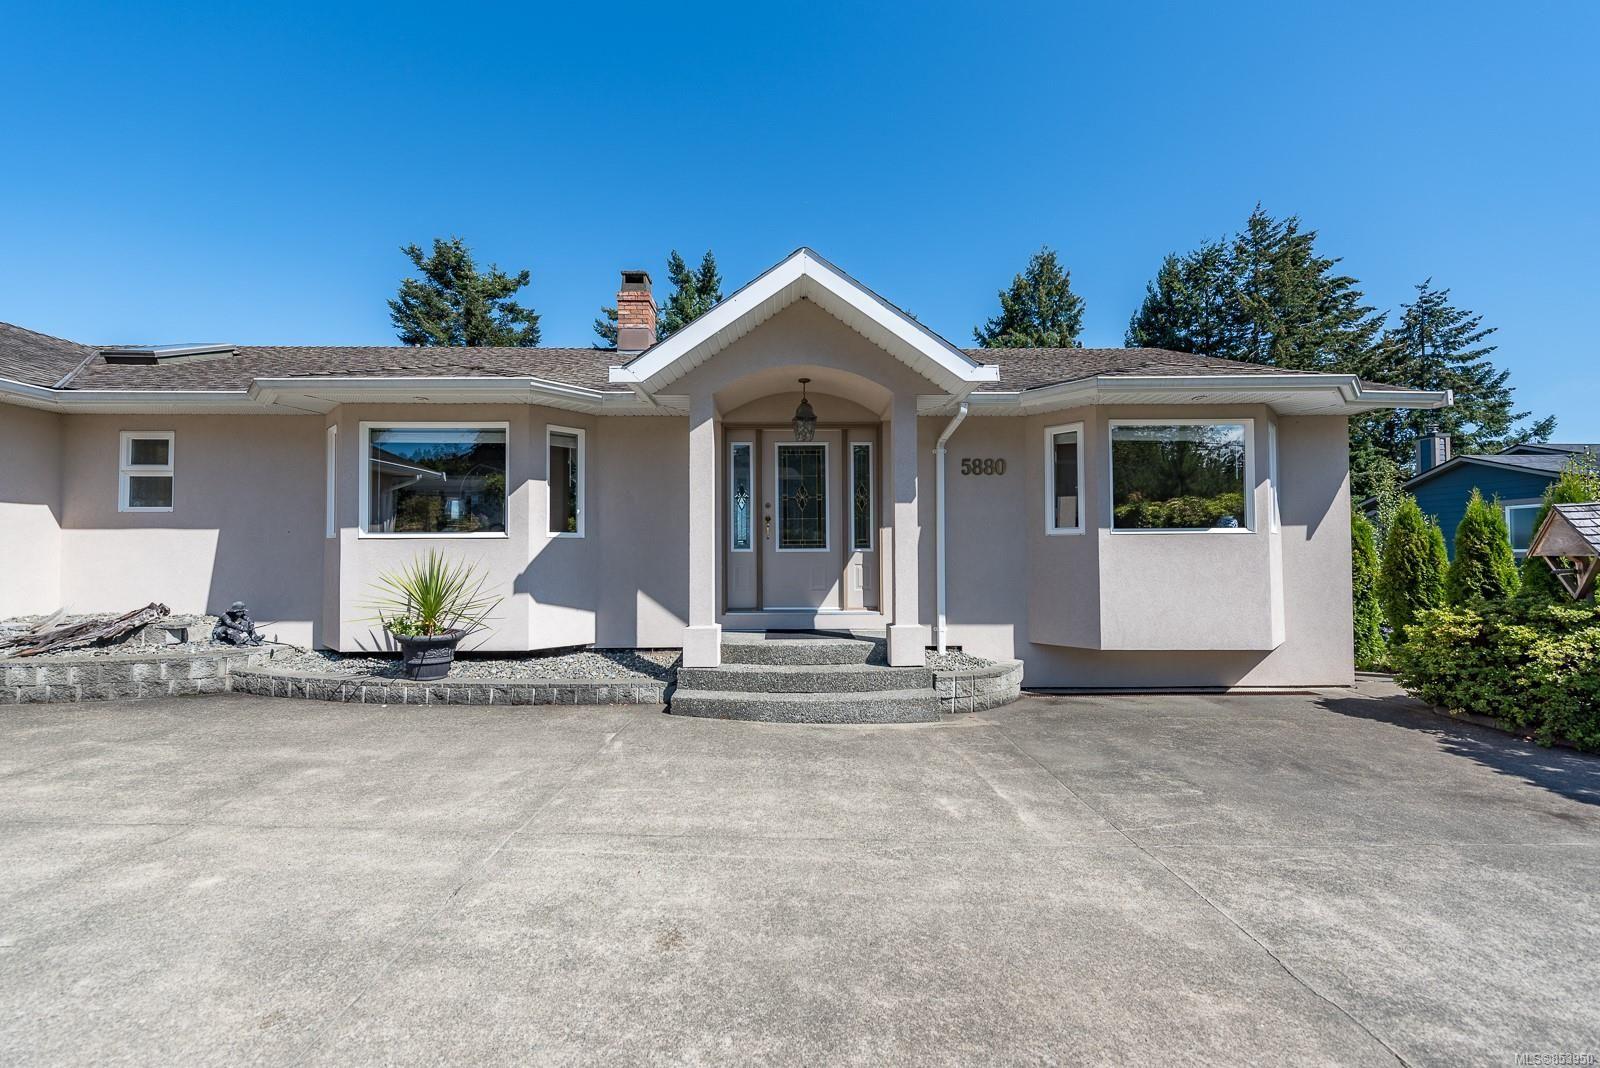 Photo 43: Photos: 5880 GARVIN Rd in : CV Union Bay/Fanny Bay House for sale (Comox Valley)  : MLS®# 853950